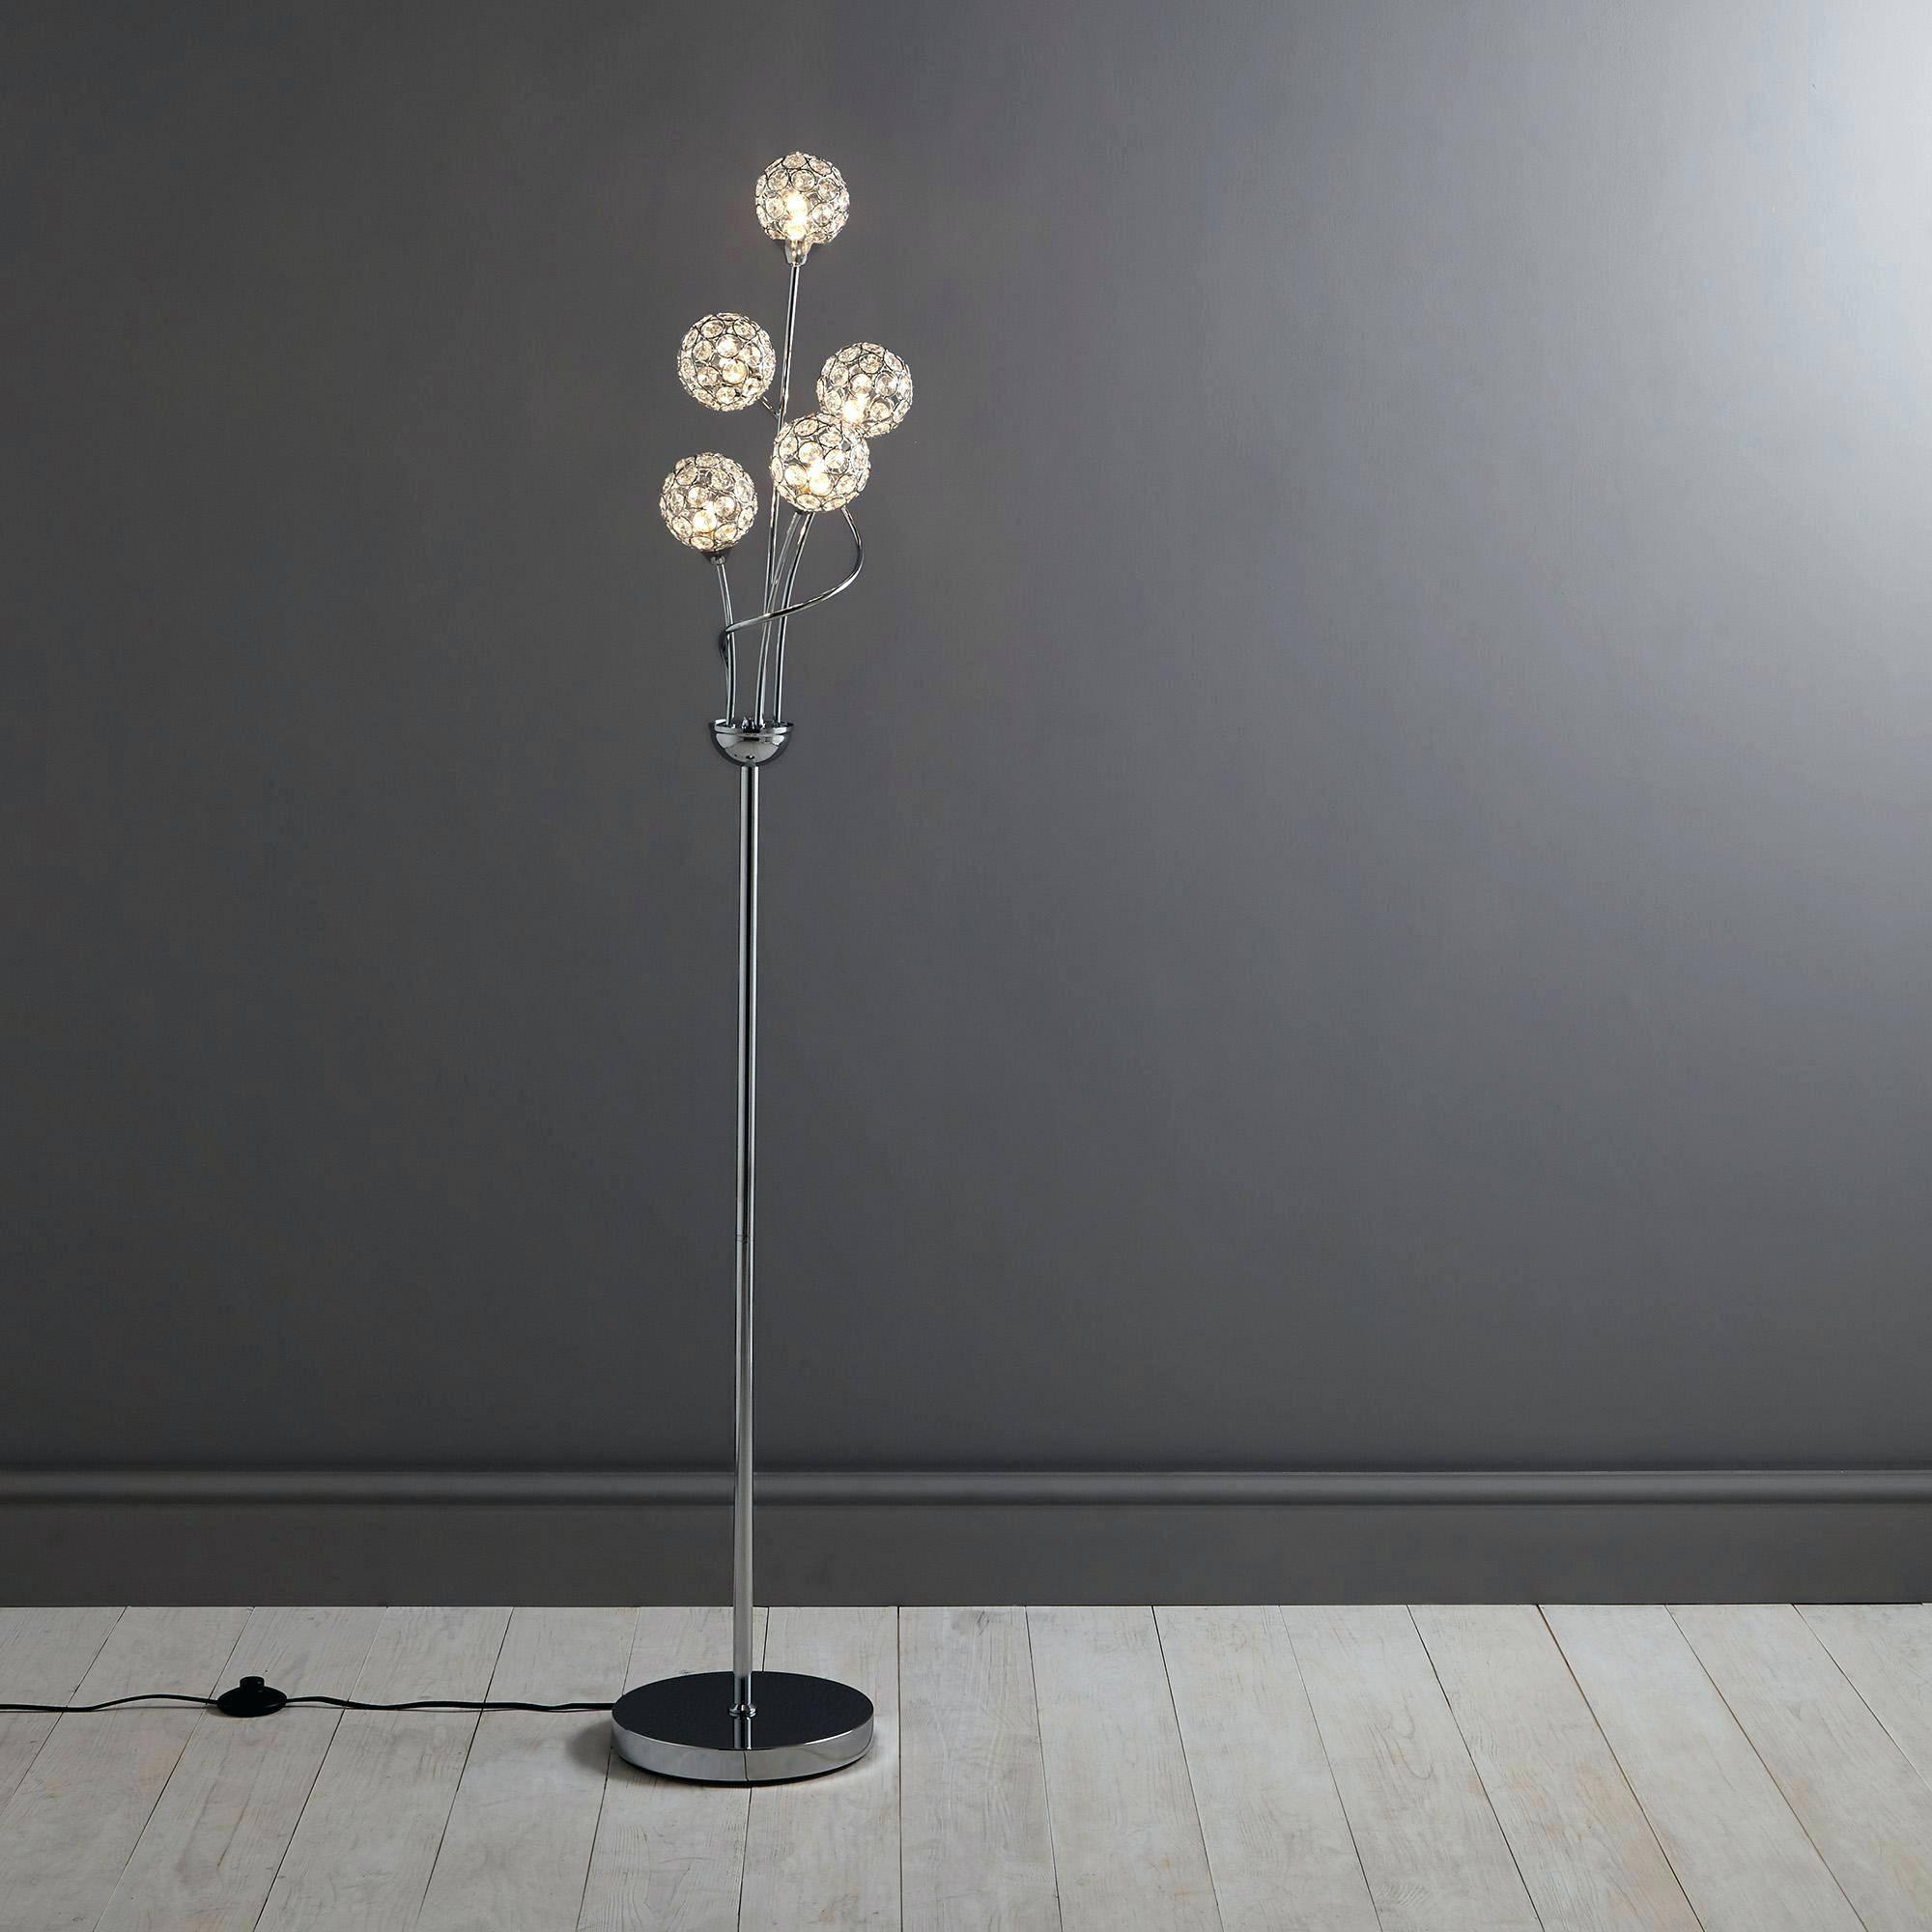 Floor Lamp ~ Mantra Dali Modern Design Chrome Floor Standard Lamp regarding John Lewis Glass Lamp Shades (Image 3 of 15)